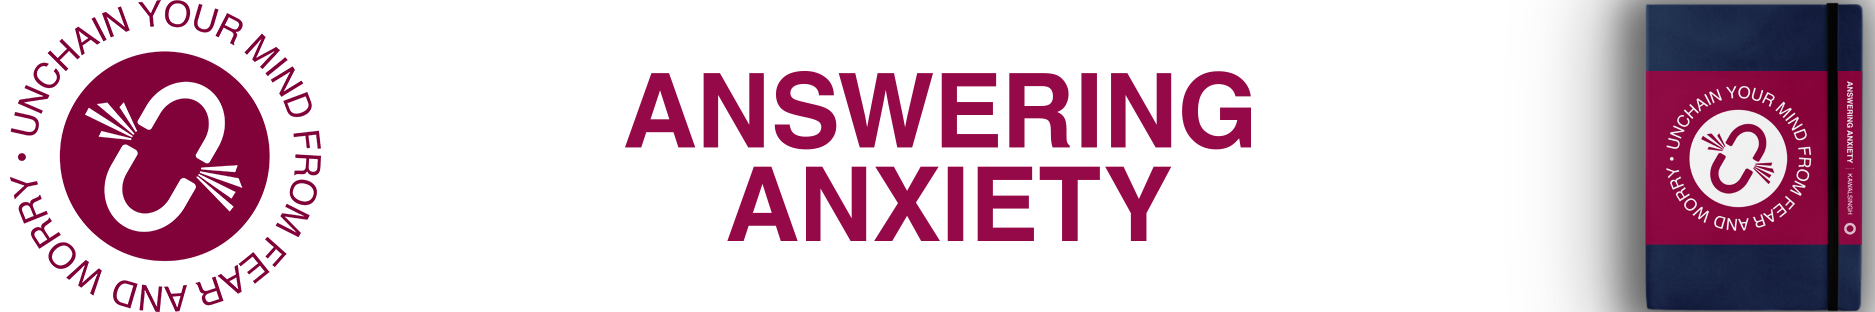 Answering Anxiety | Chip Kawalsingh